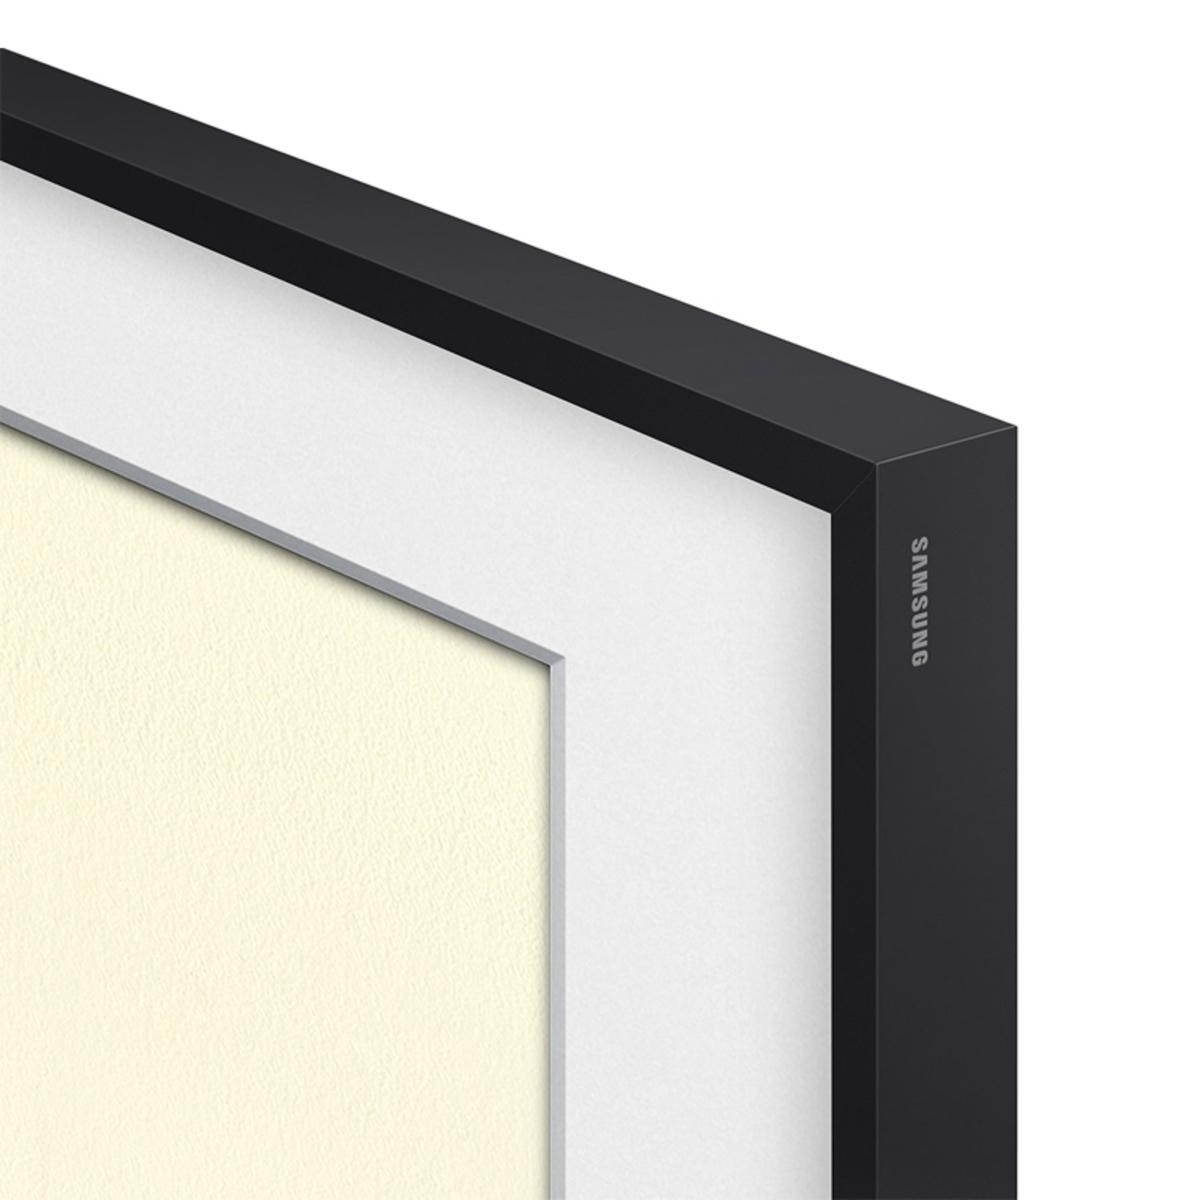 "Image of Samsung VGSCFN55BM 55"" The Frame (2019) Customizable Bezel - Black"